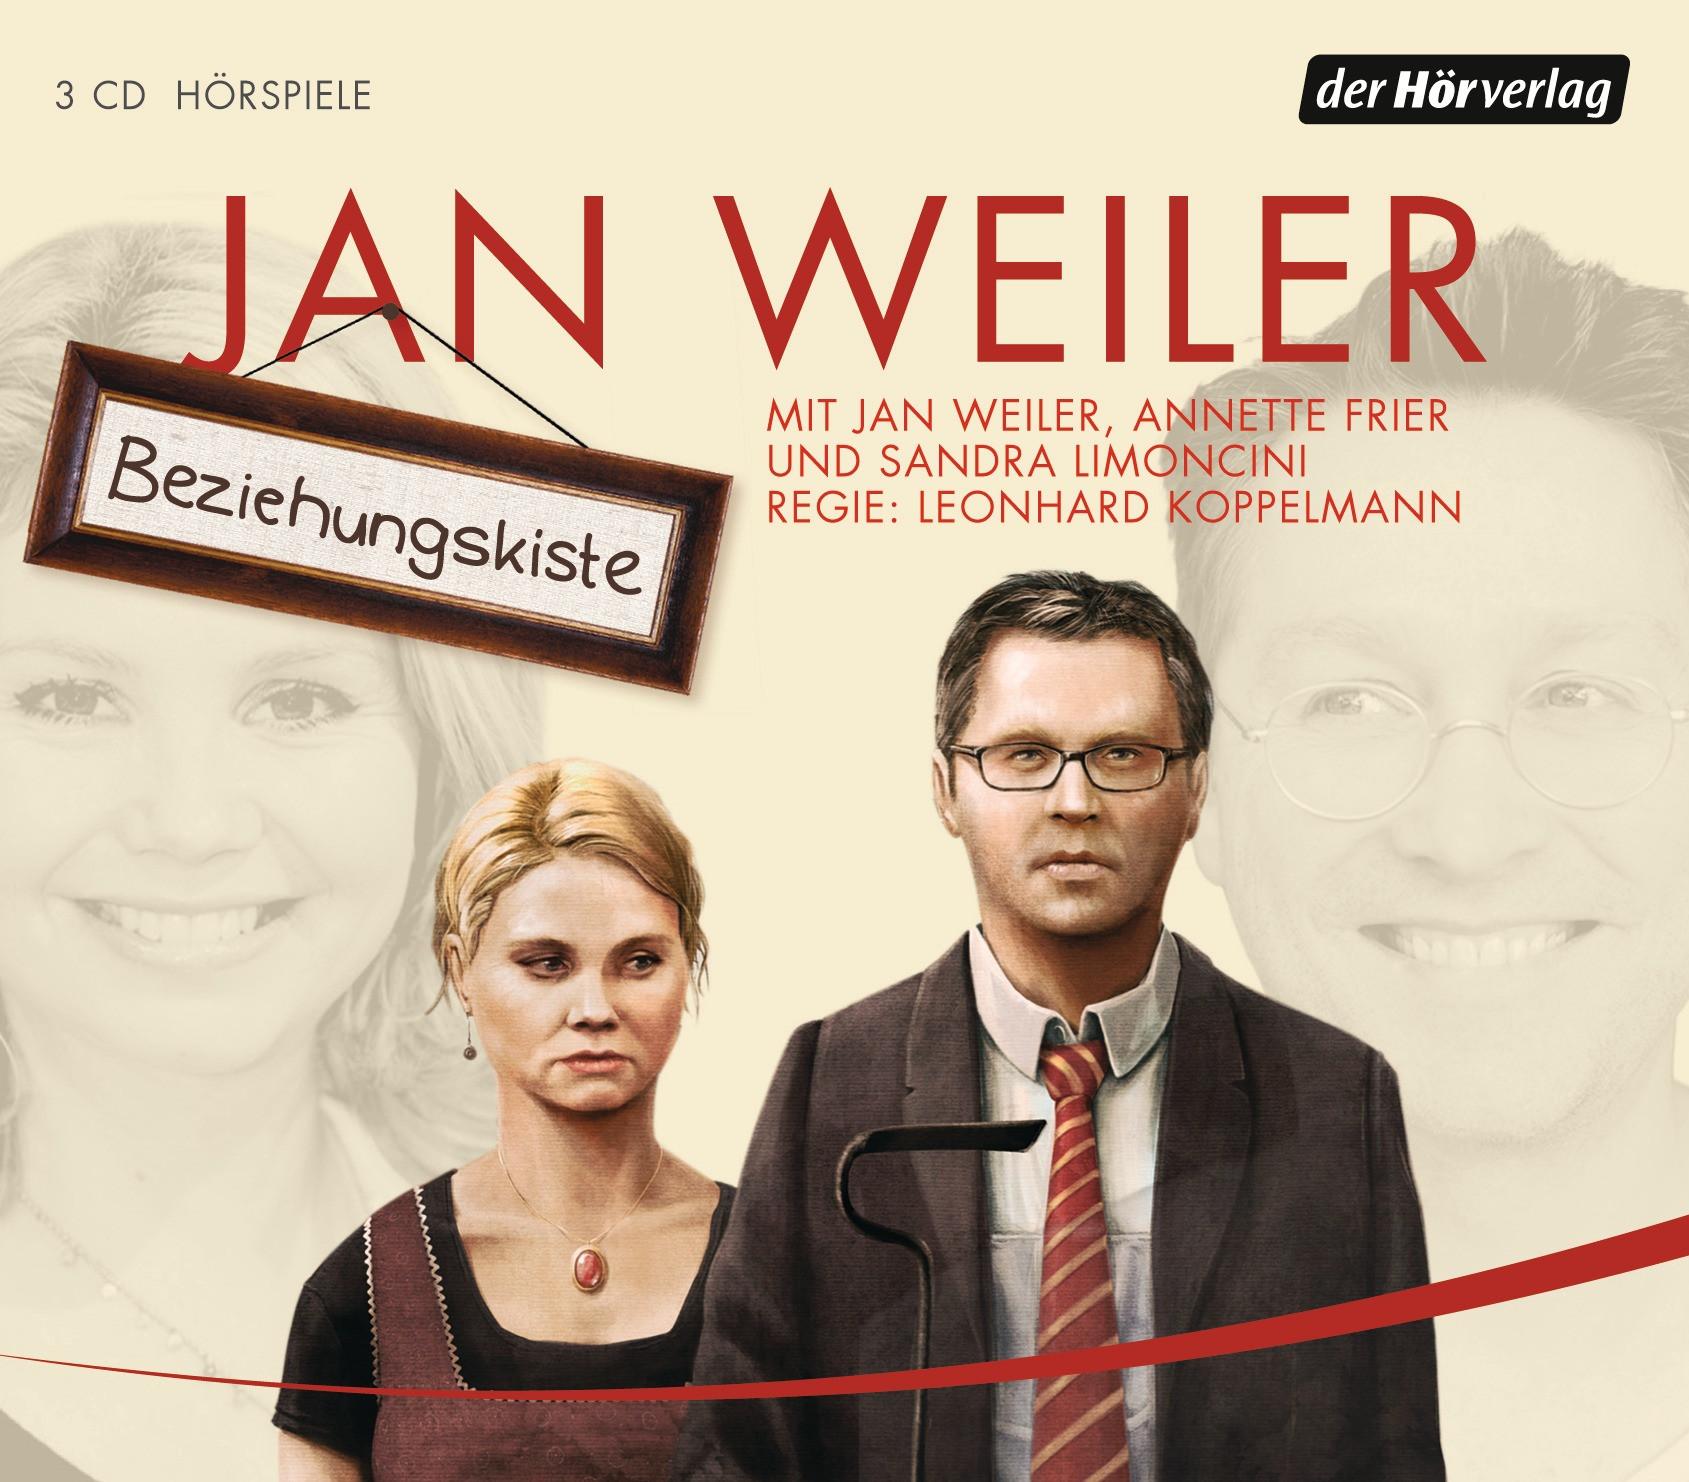 Jan Weiler - Beziehungskiste (Hörspiel)